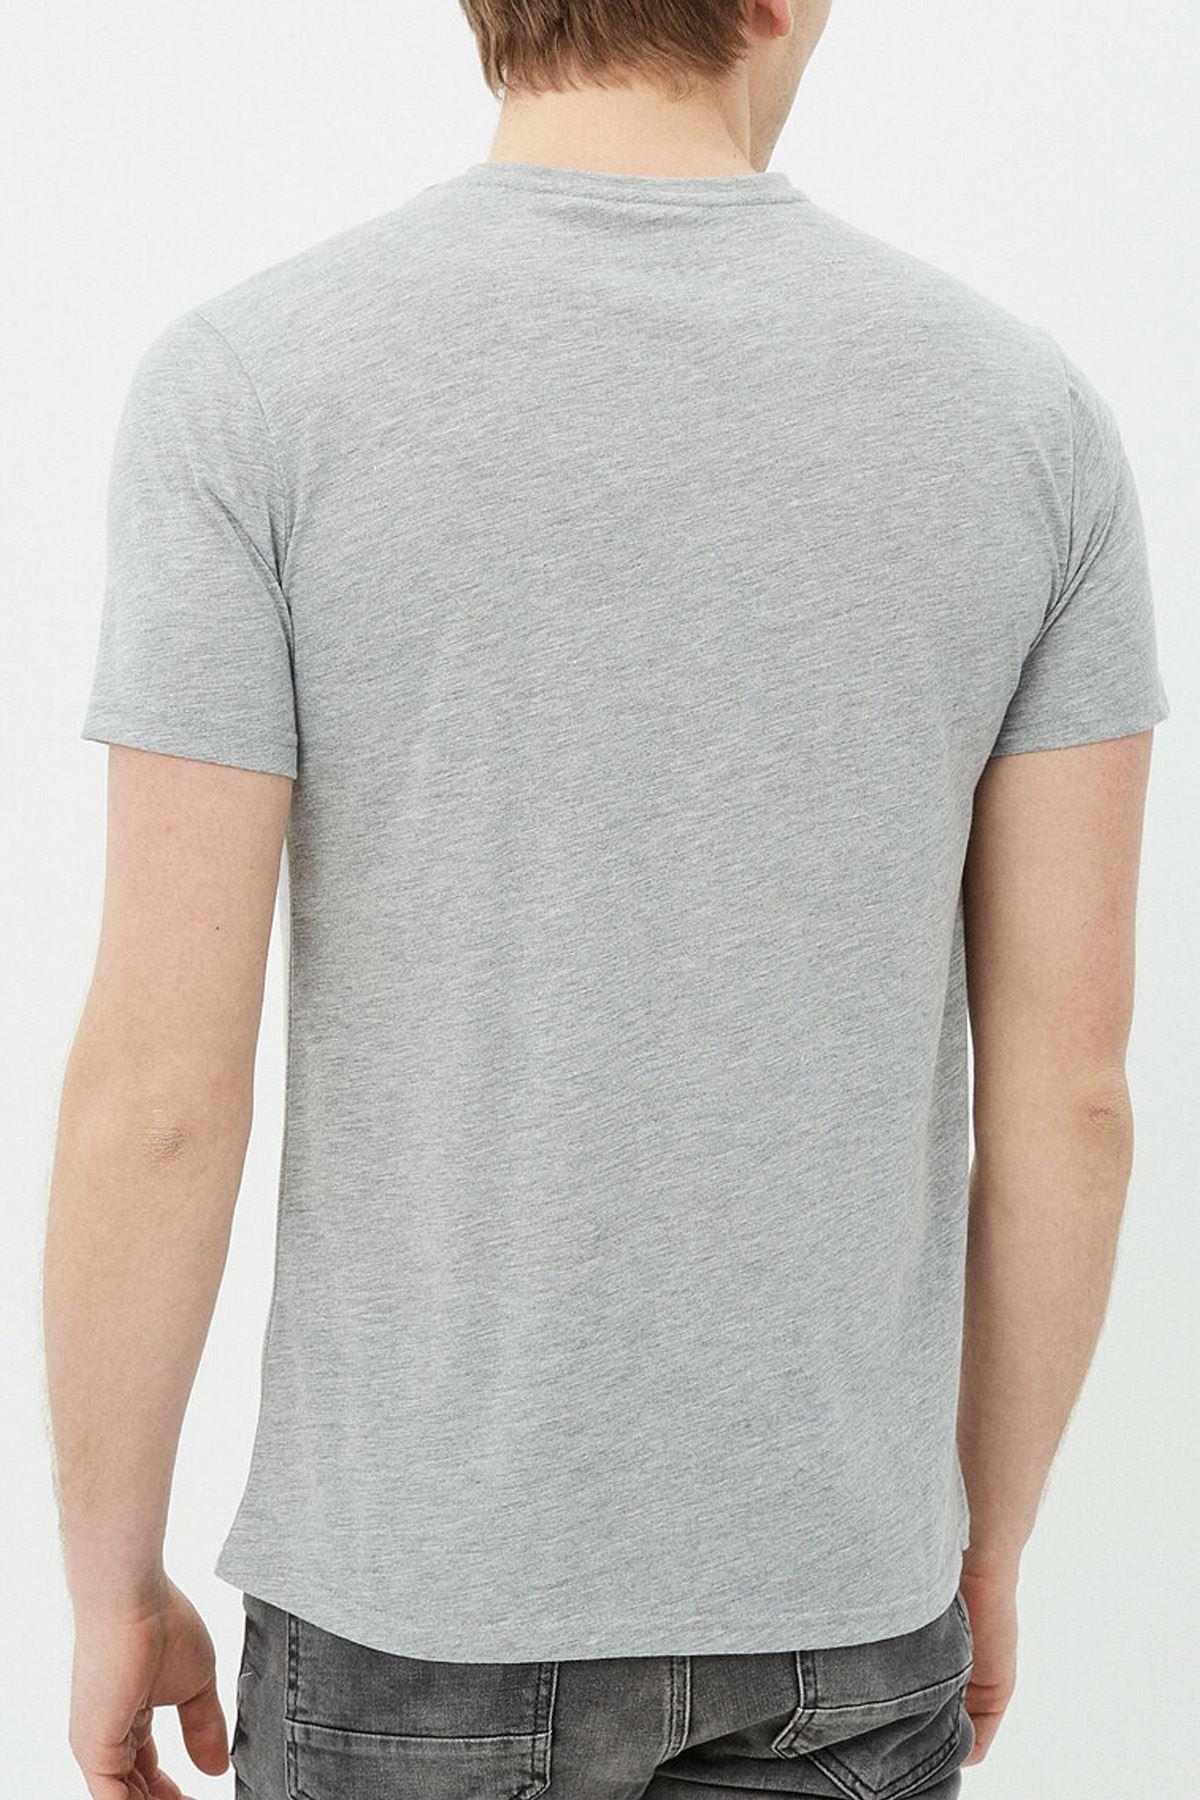 Anime Let's Jam Gri Erkek Tshirt - Tişört